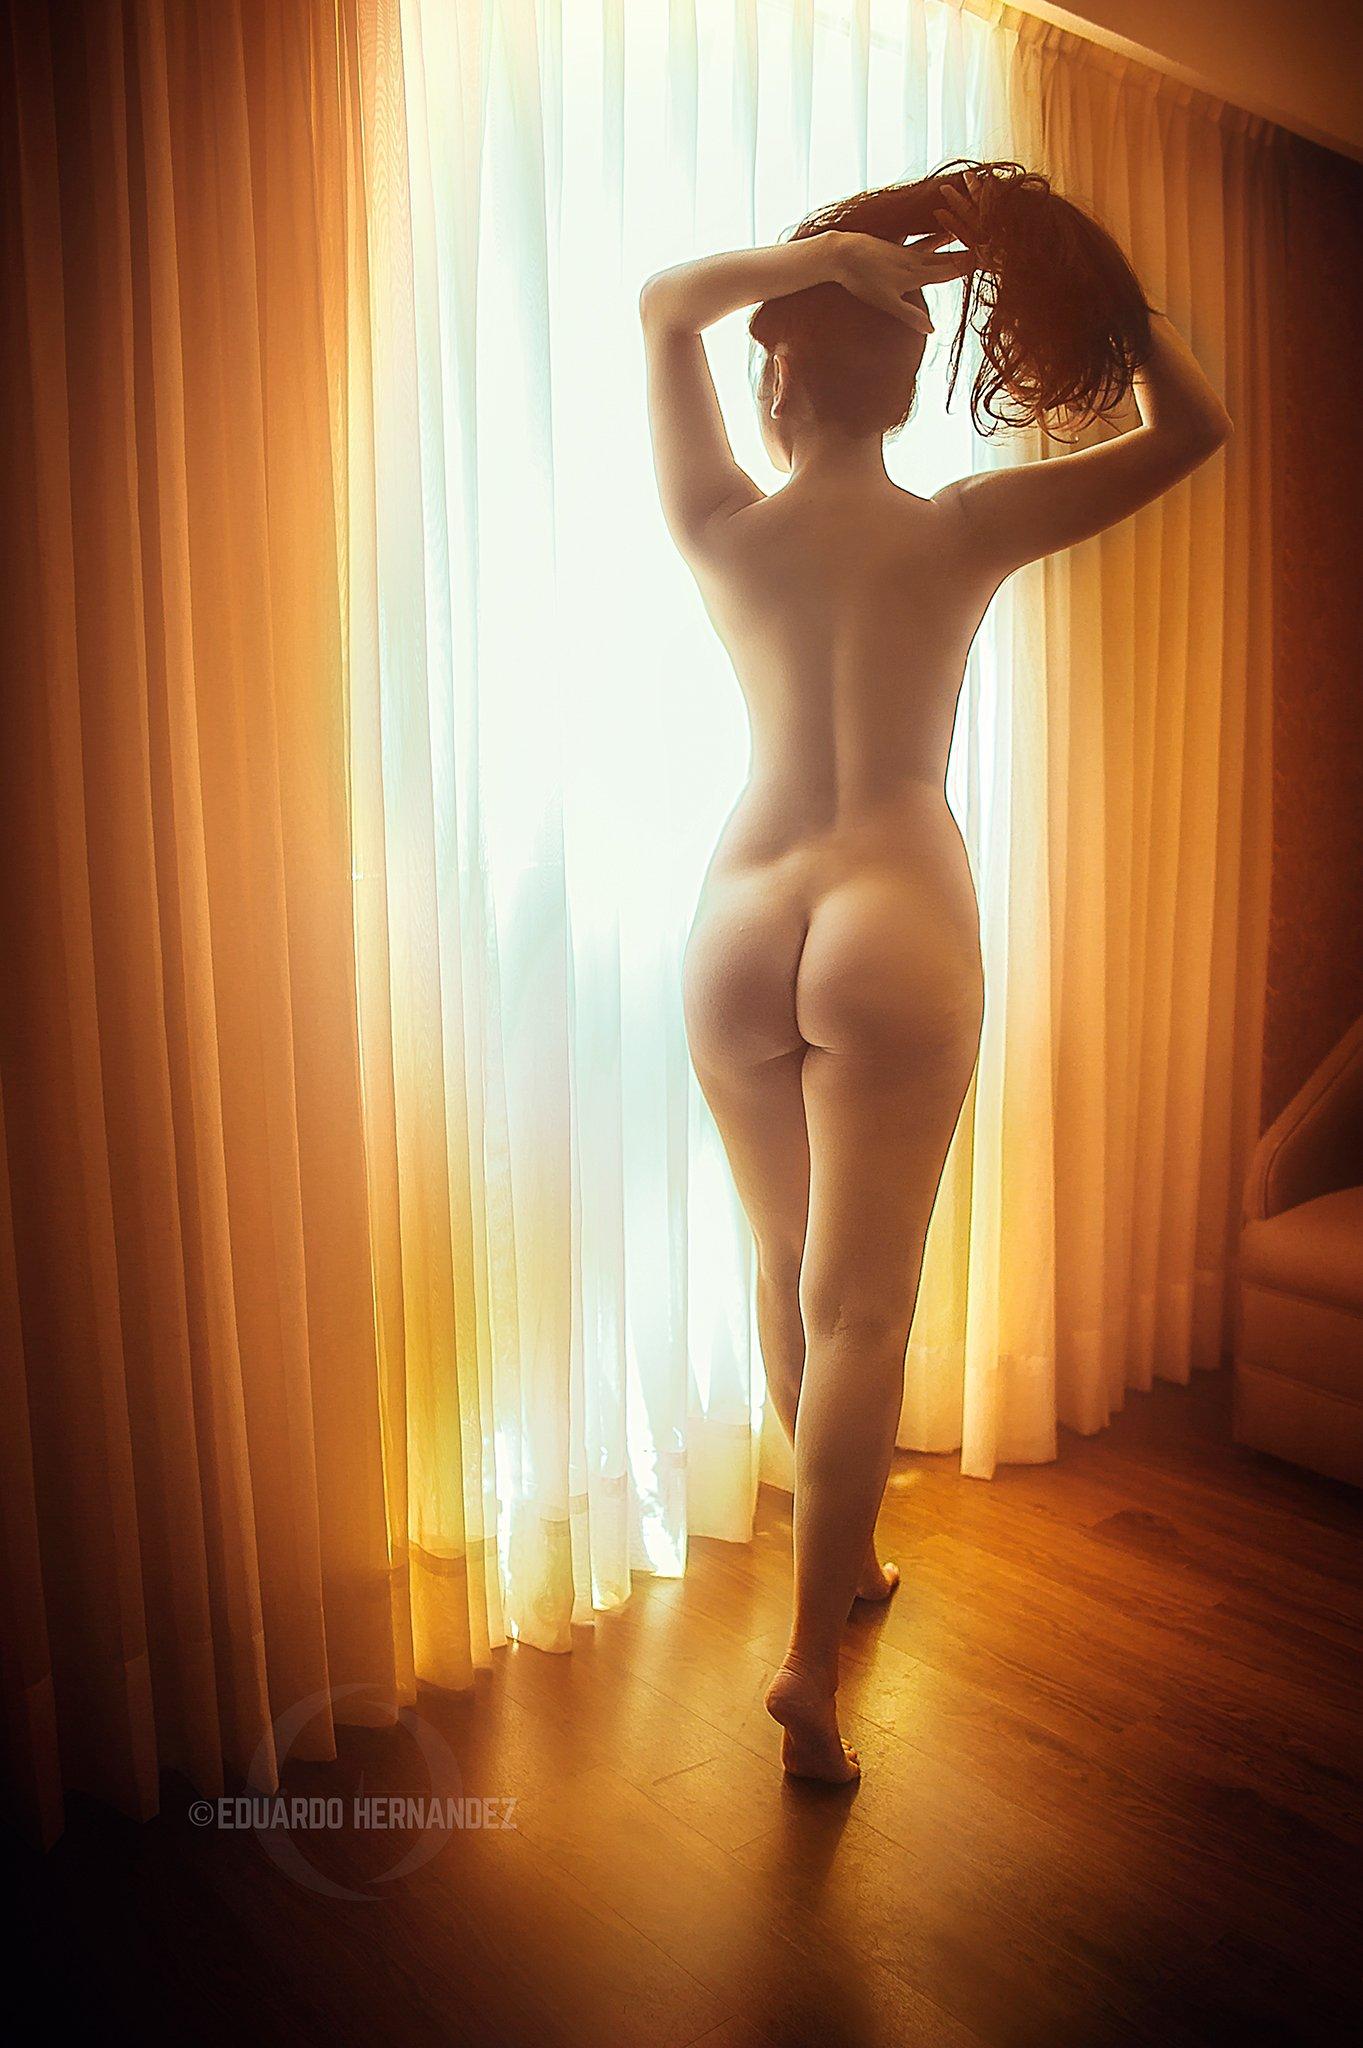 portrait, nude, cdmx, hdzphoto,, Eduardo Hernández